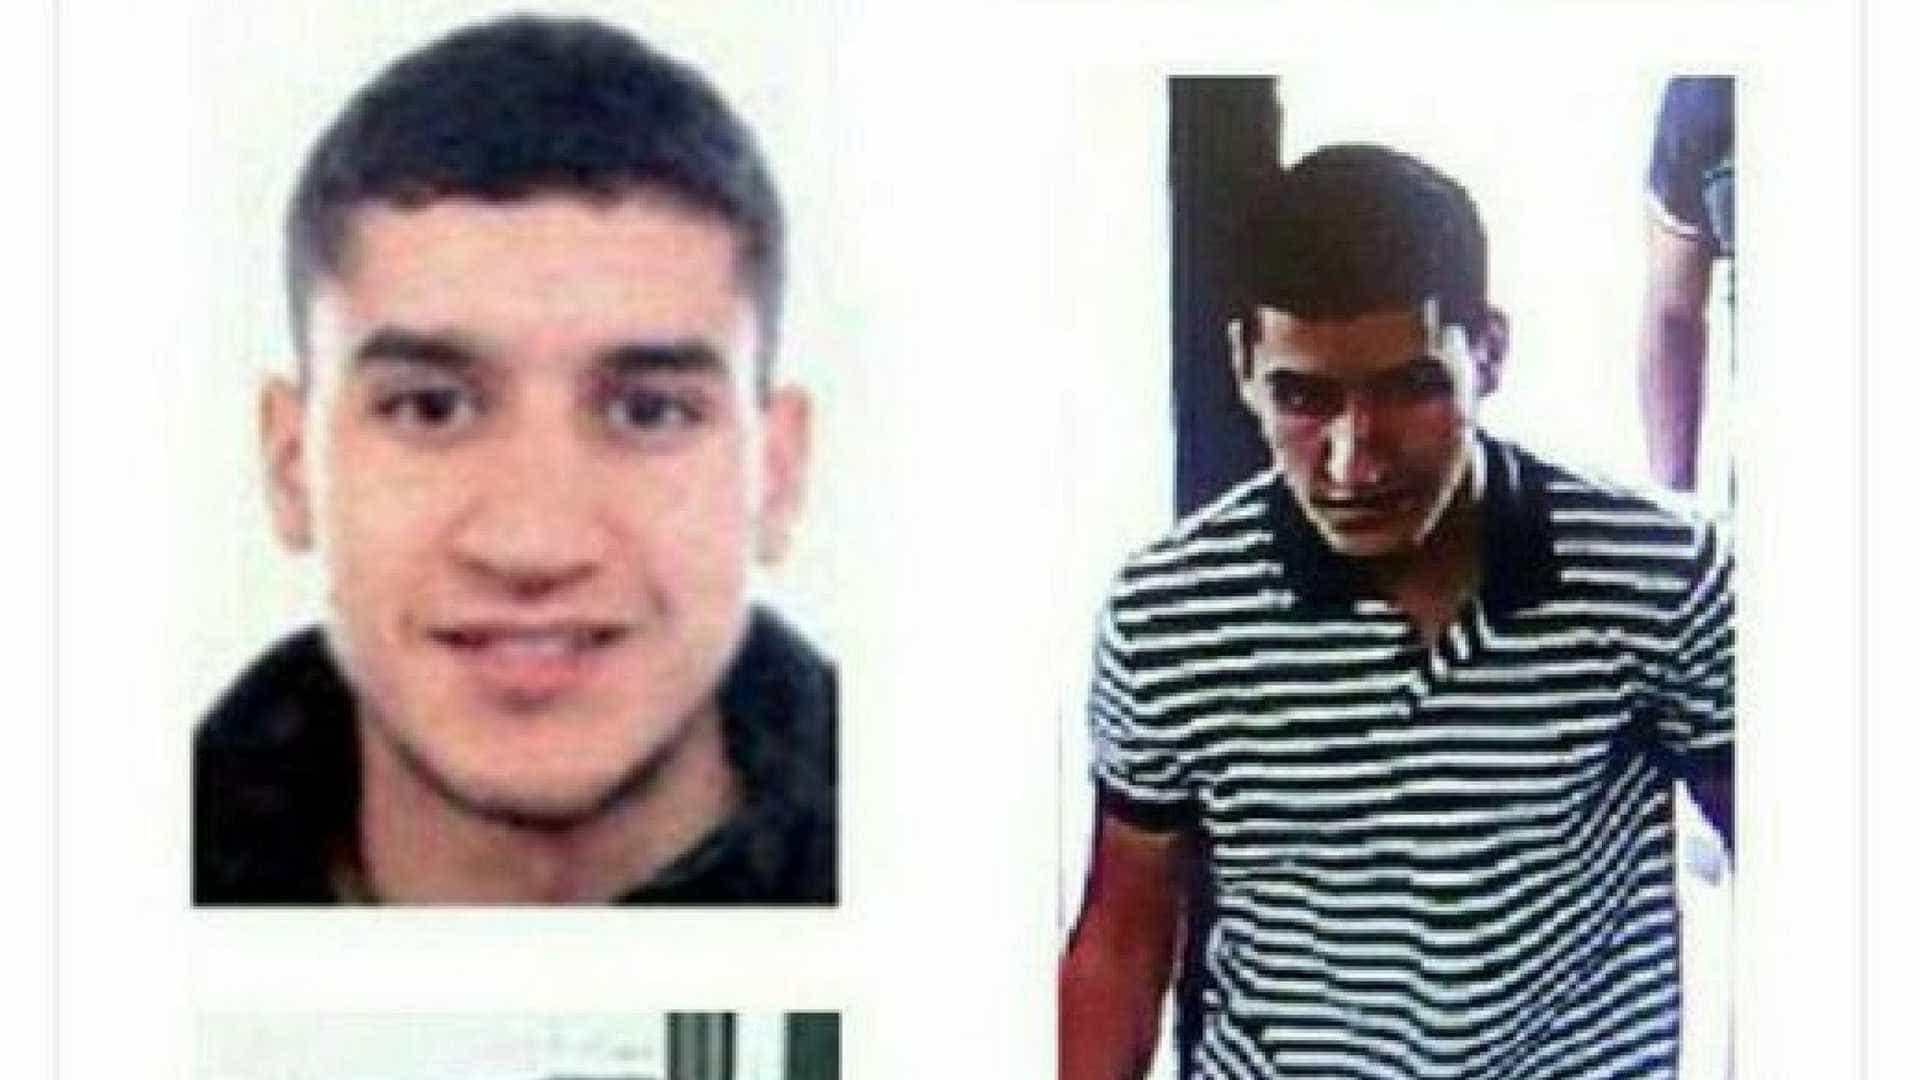 Oficial: Suspeito abatido é Younes Abouyaaqoub, autor do atentado